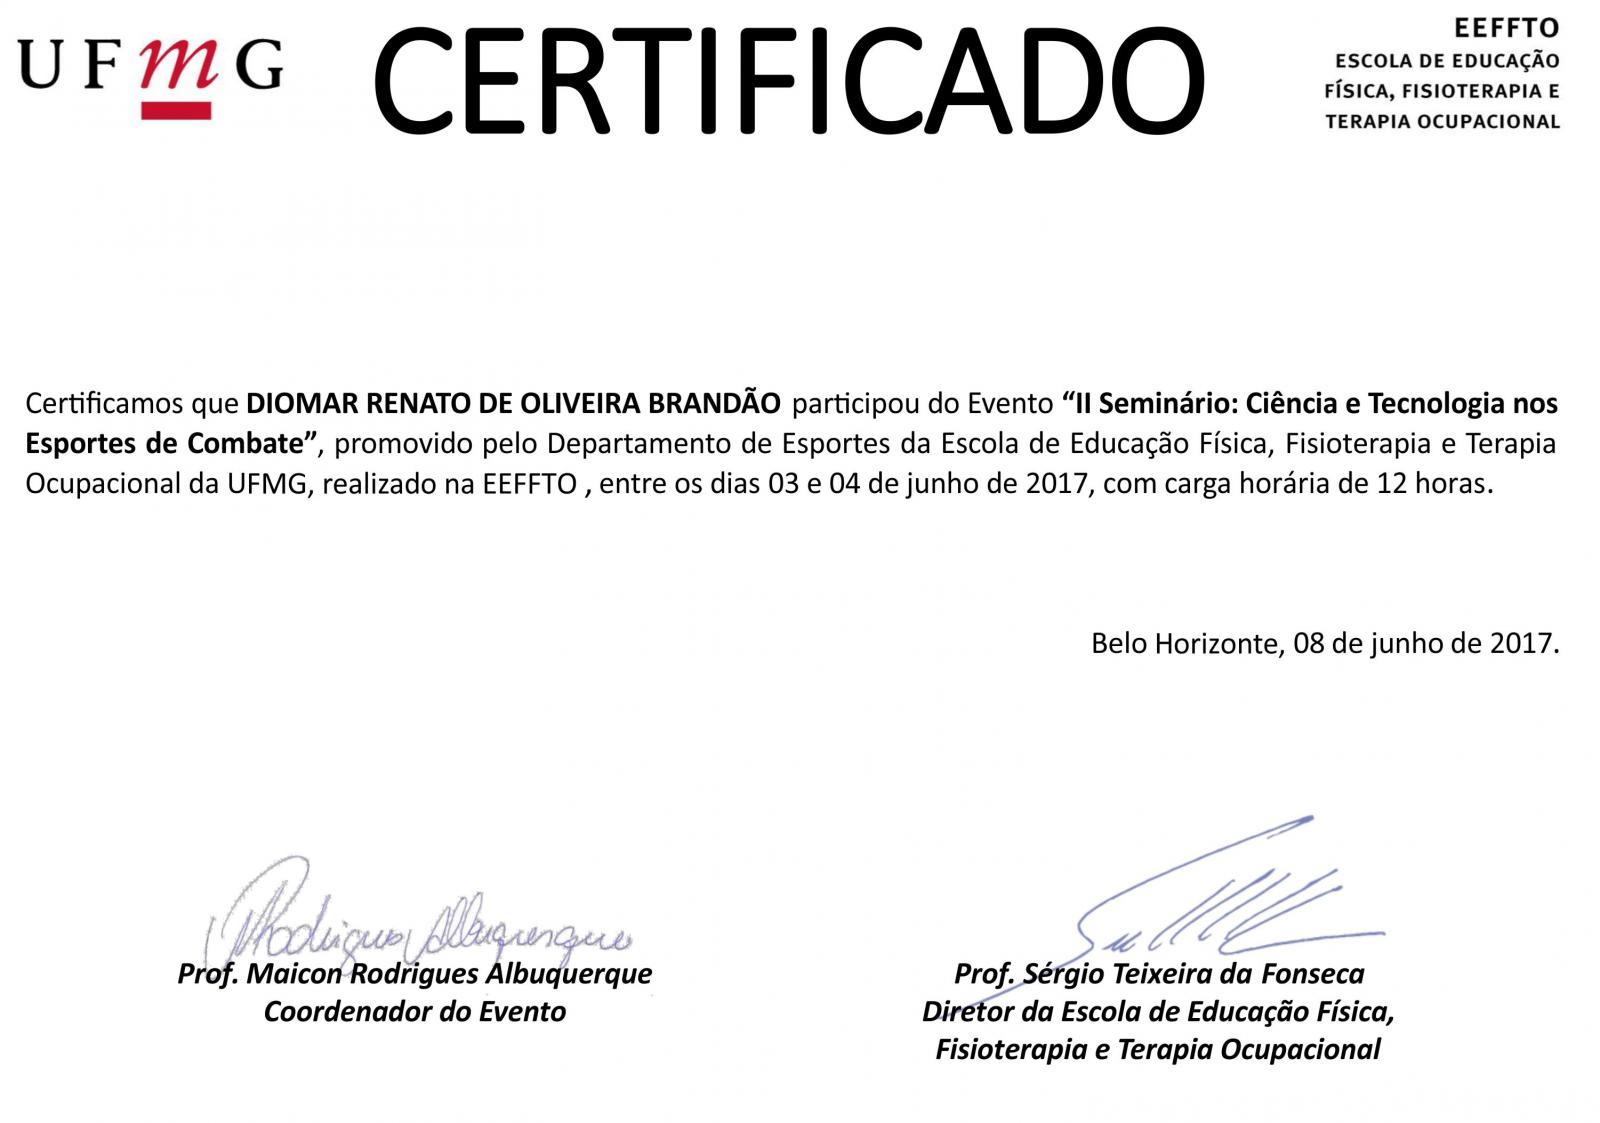 certificado%20curso%20ufmg%20ciencia%20e